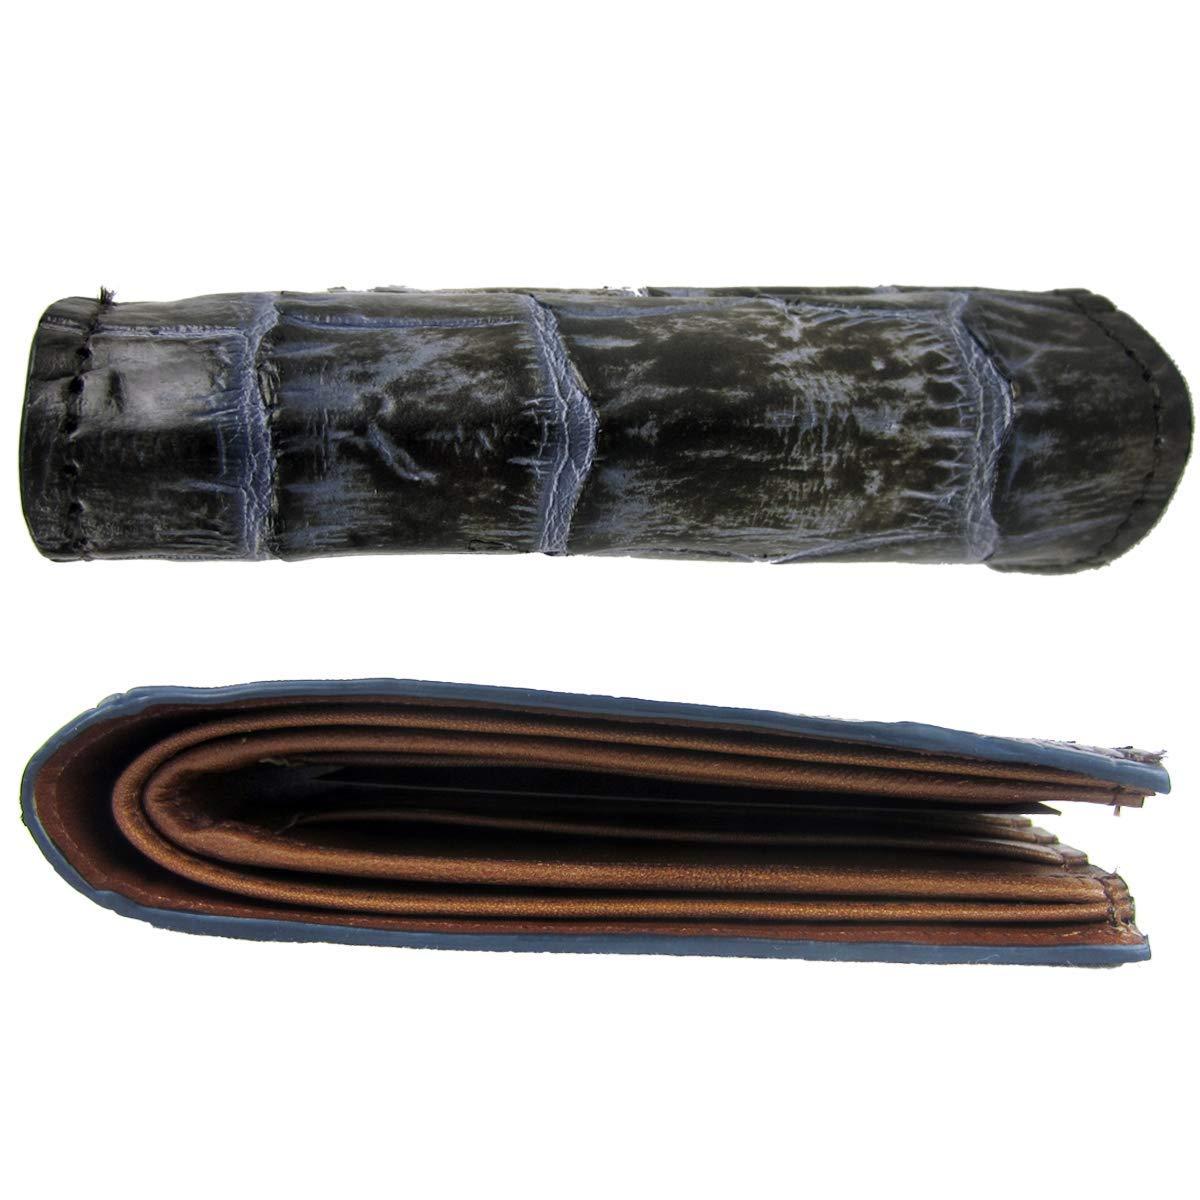 B2690AL Cuadra Exotic Blue Alligator Belly Leather Bifold Wallet DU171